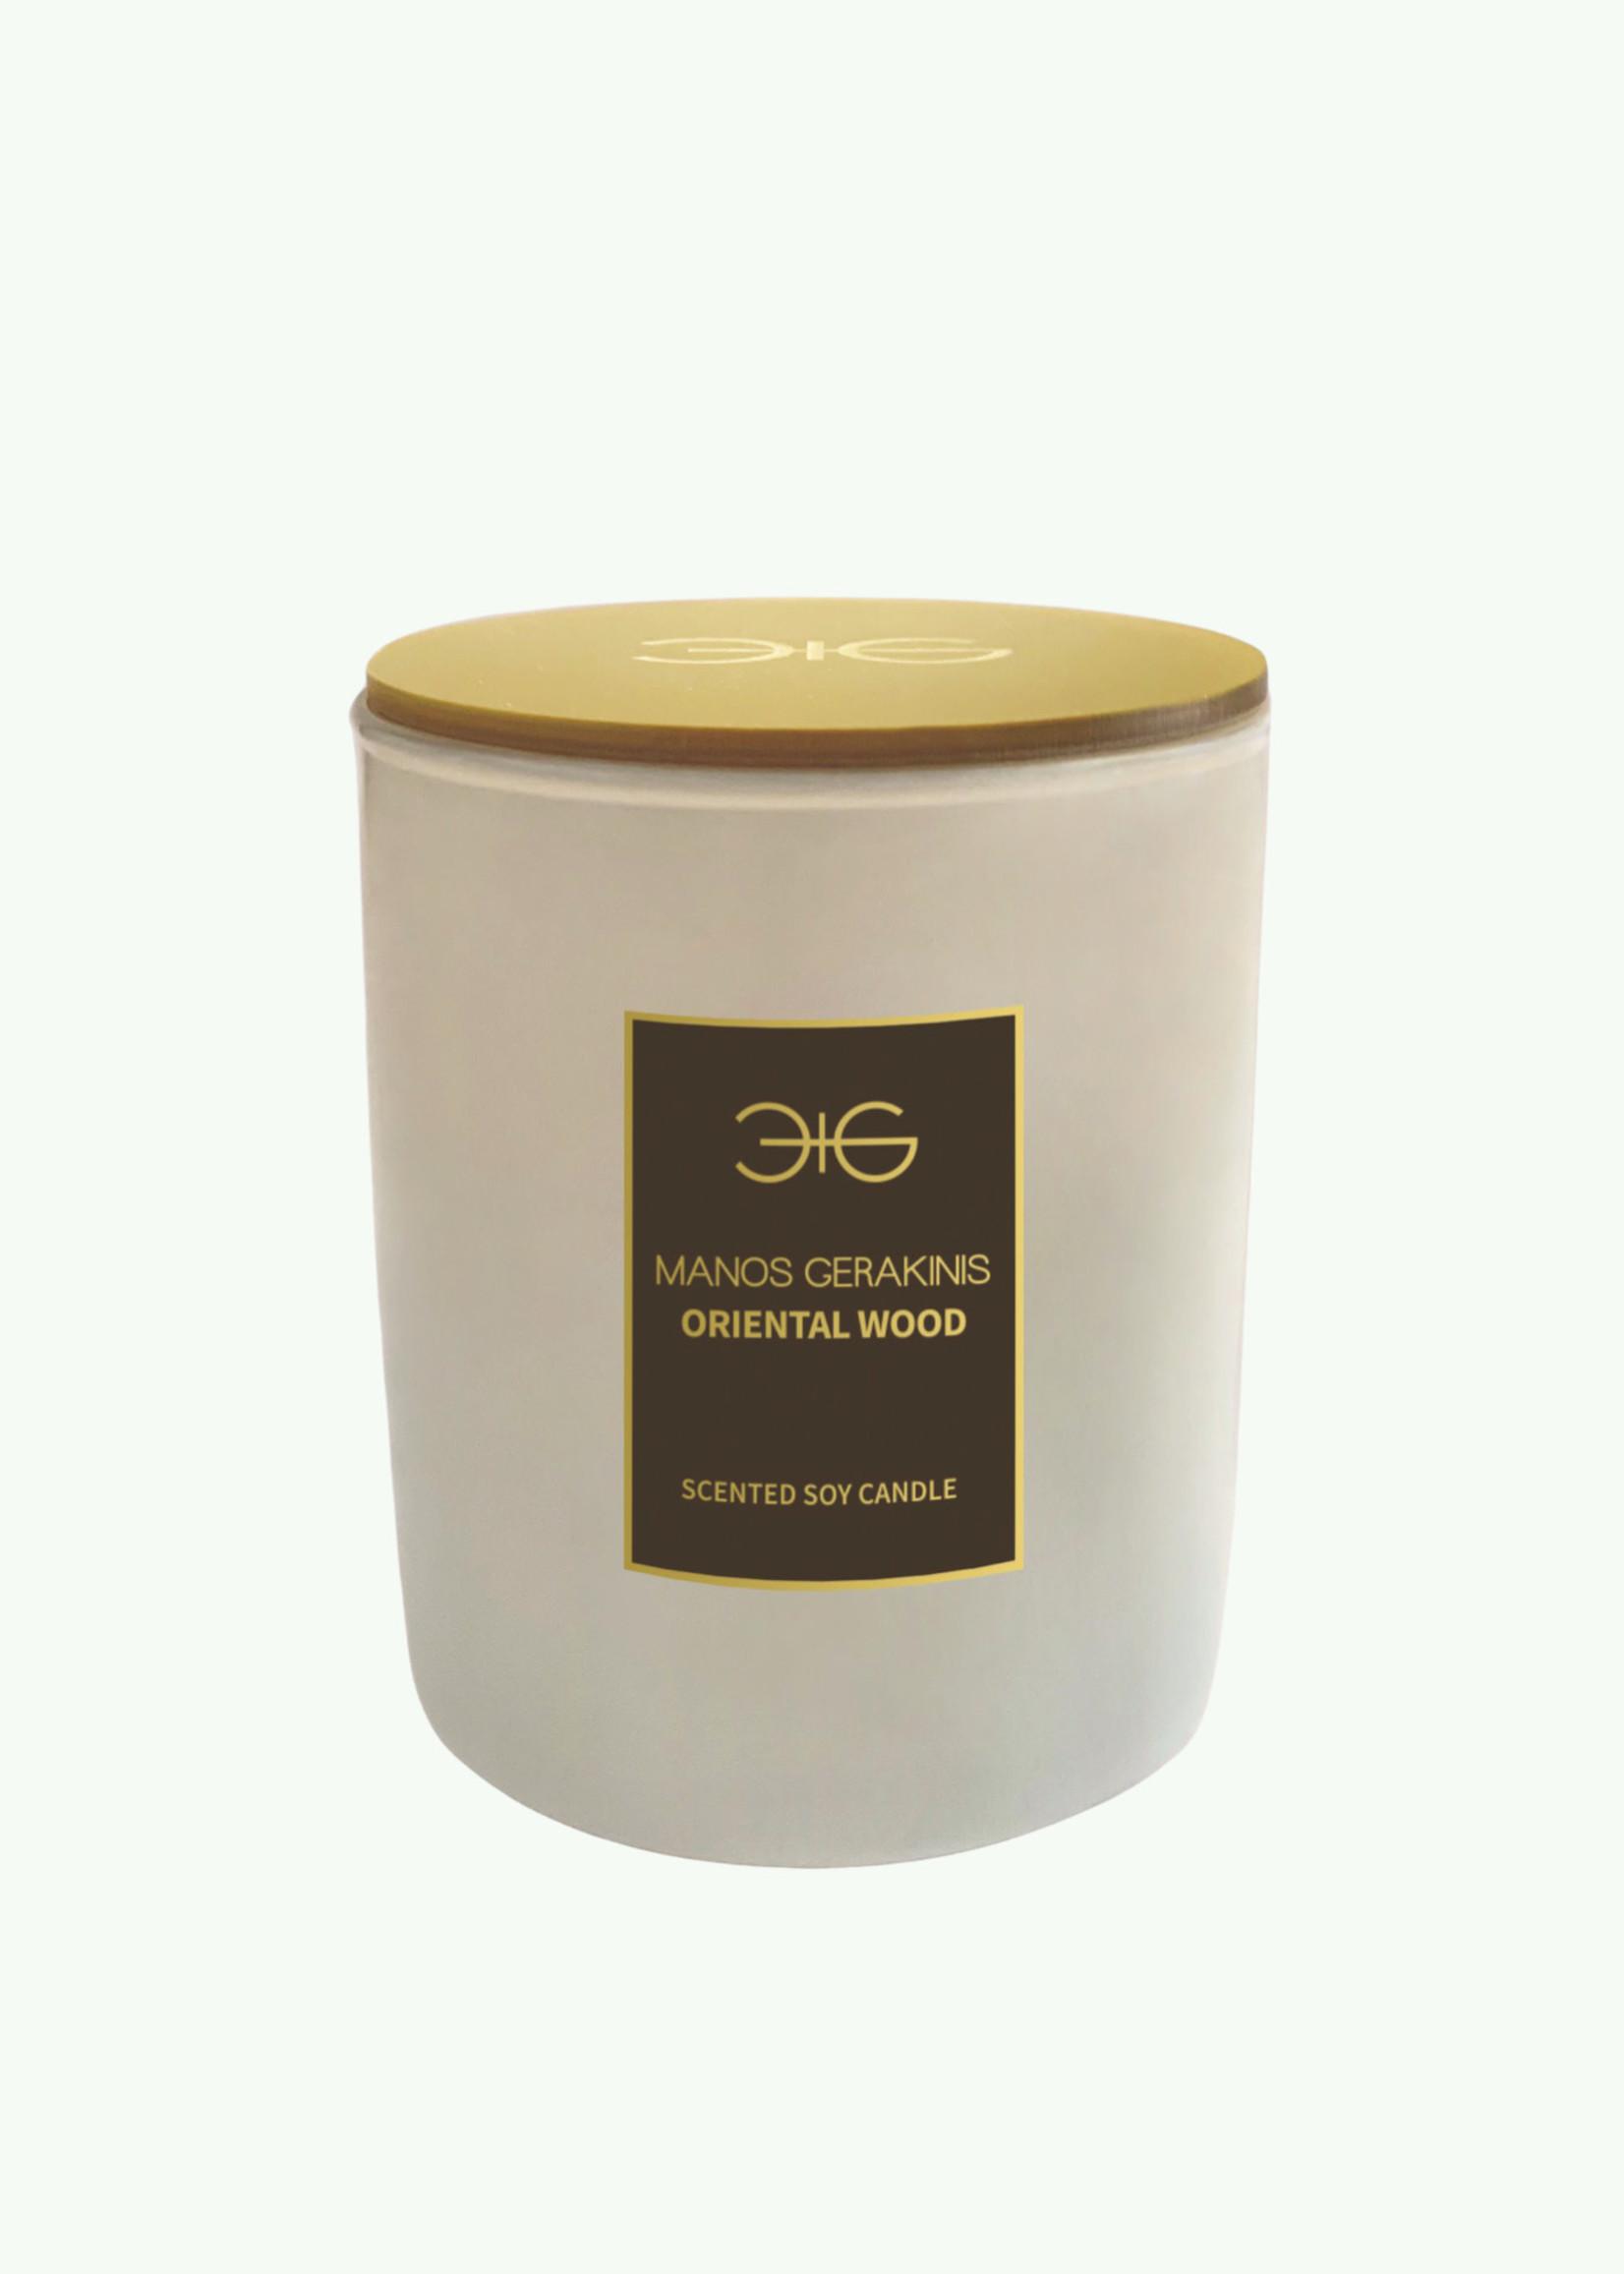 Manos Gerakinis Manos Gerakinis - Oriental Wood - Geurkaars 145 gr